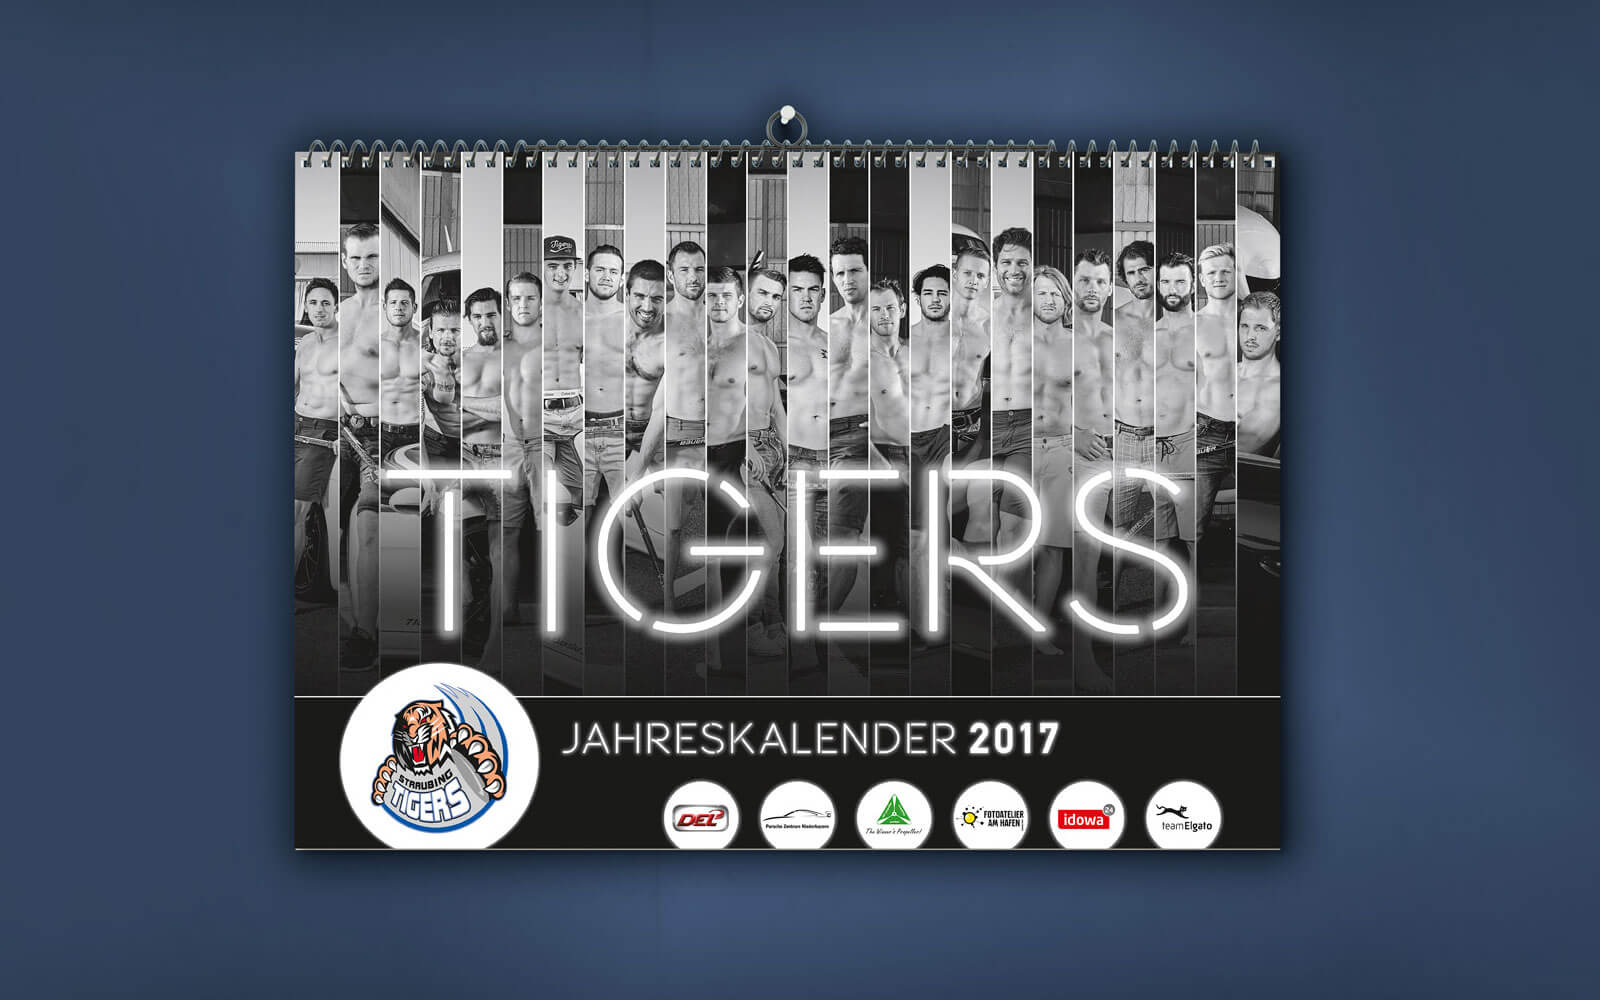 Straubing Tigers – Spielerkalender 2017 Cover